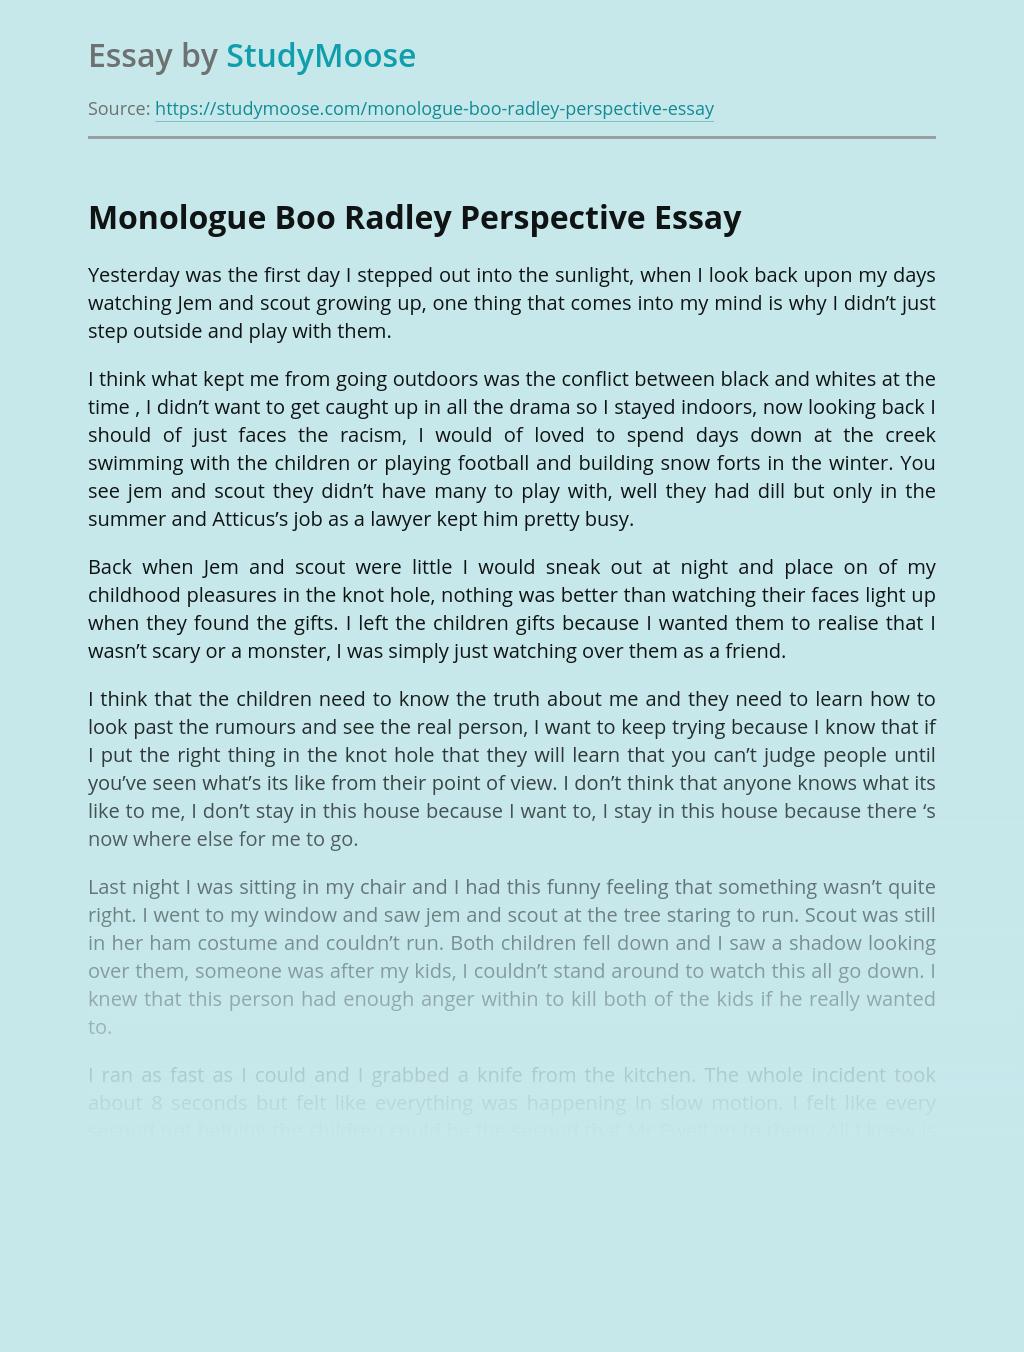 Monologue on Boo Radley Character